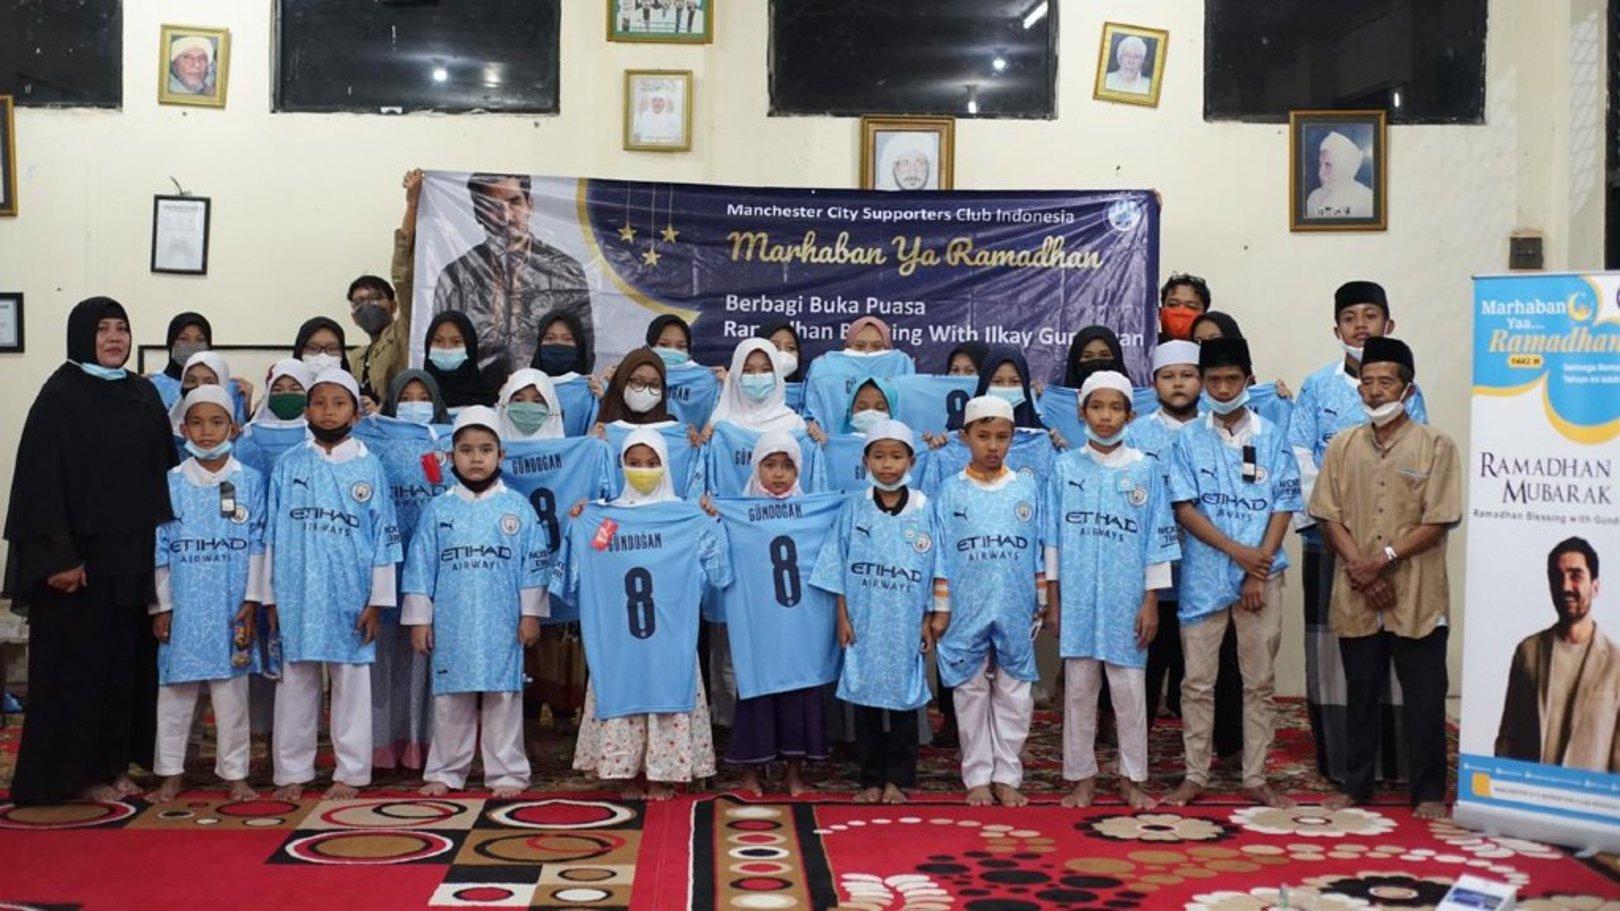 Gundogan donates meals to those in need across Indonesia